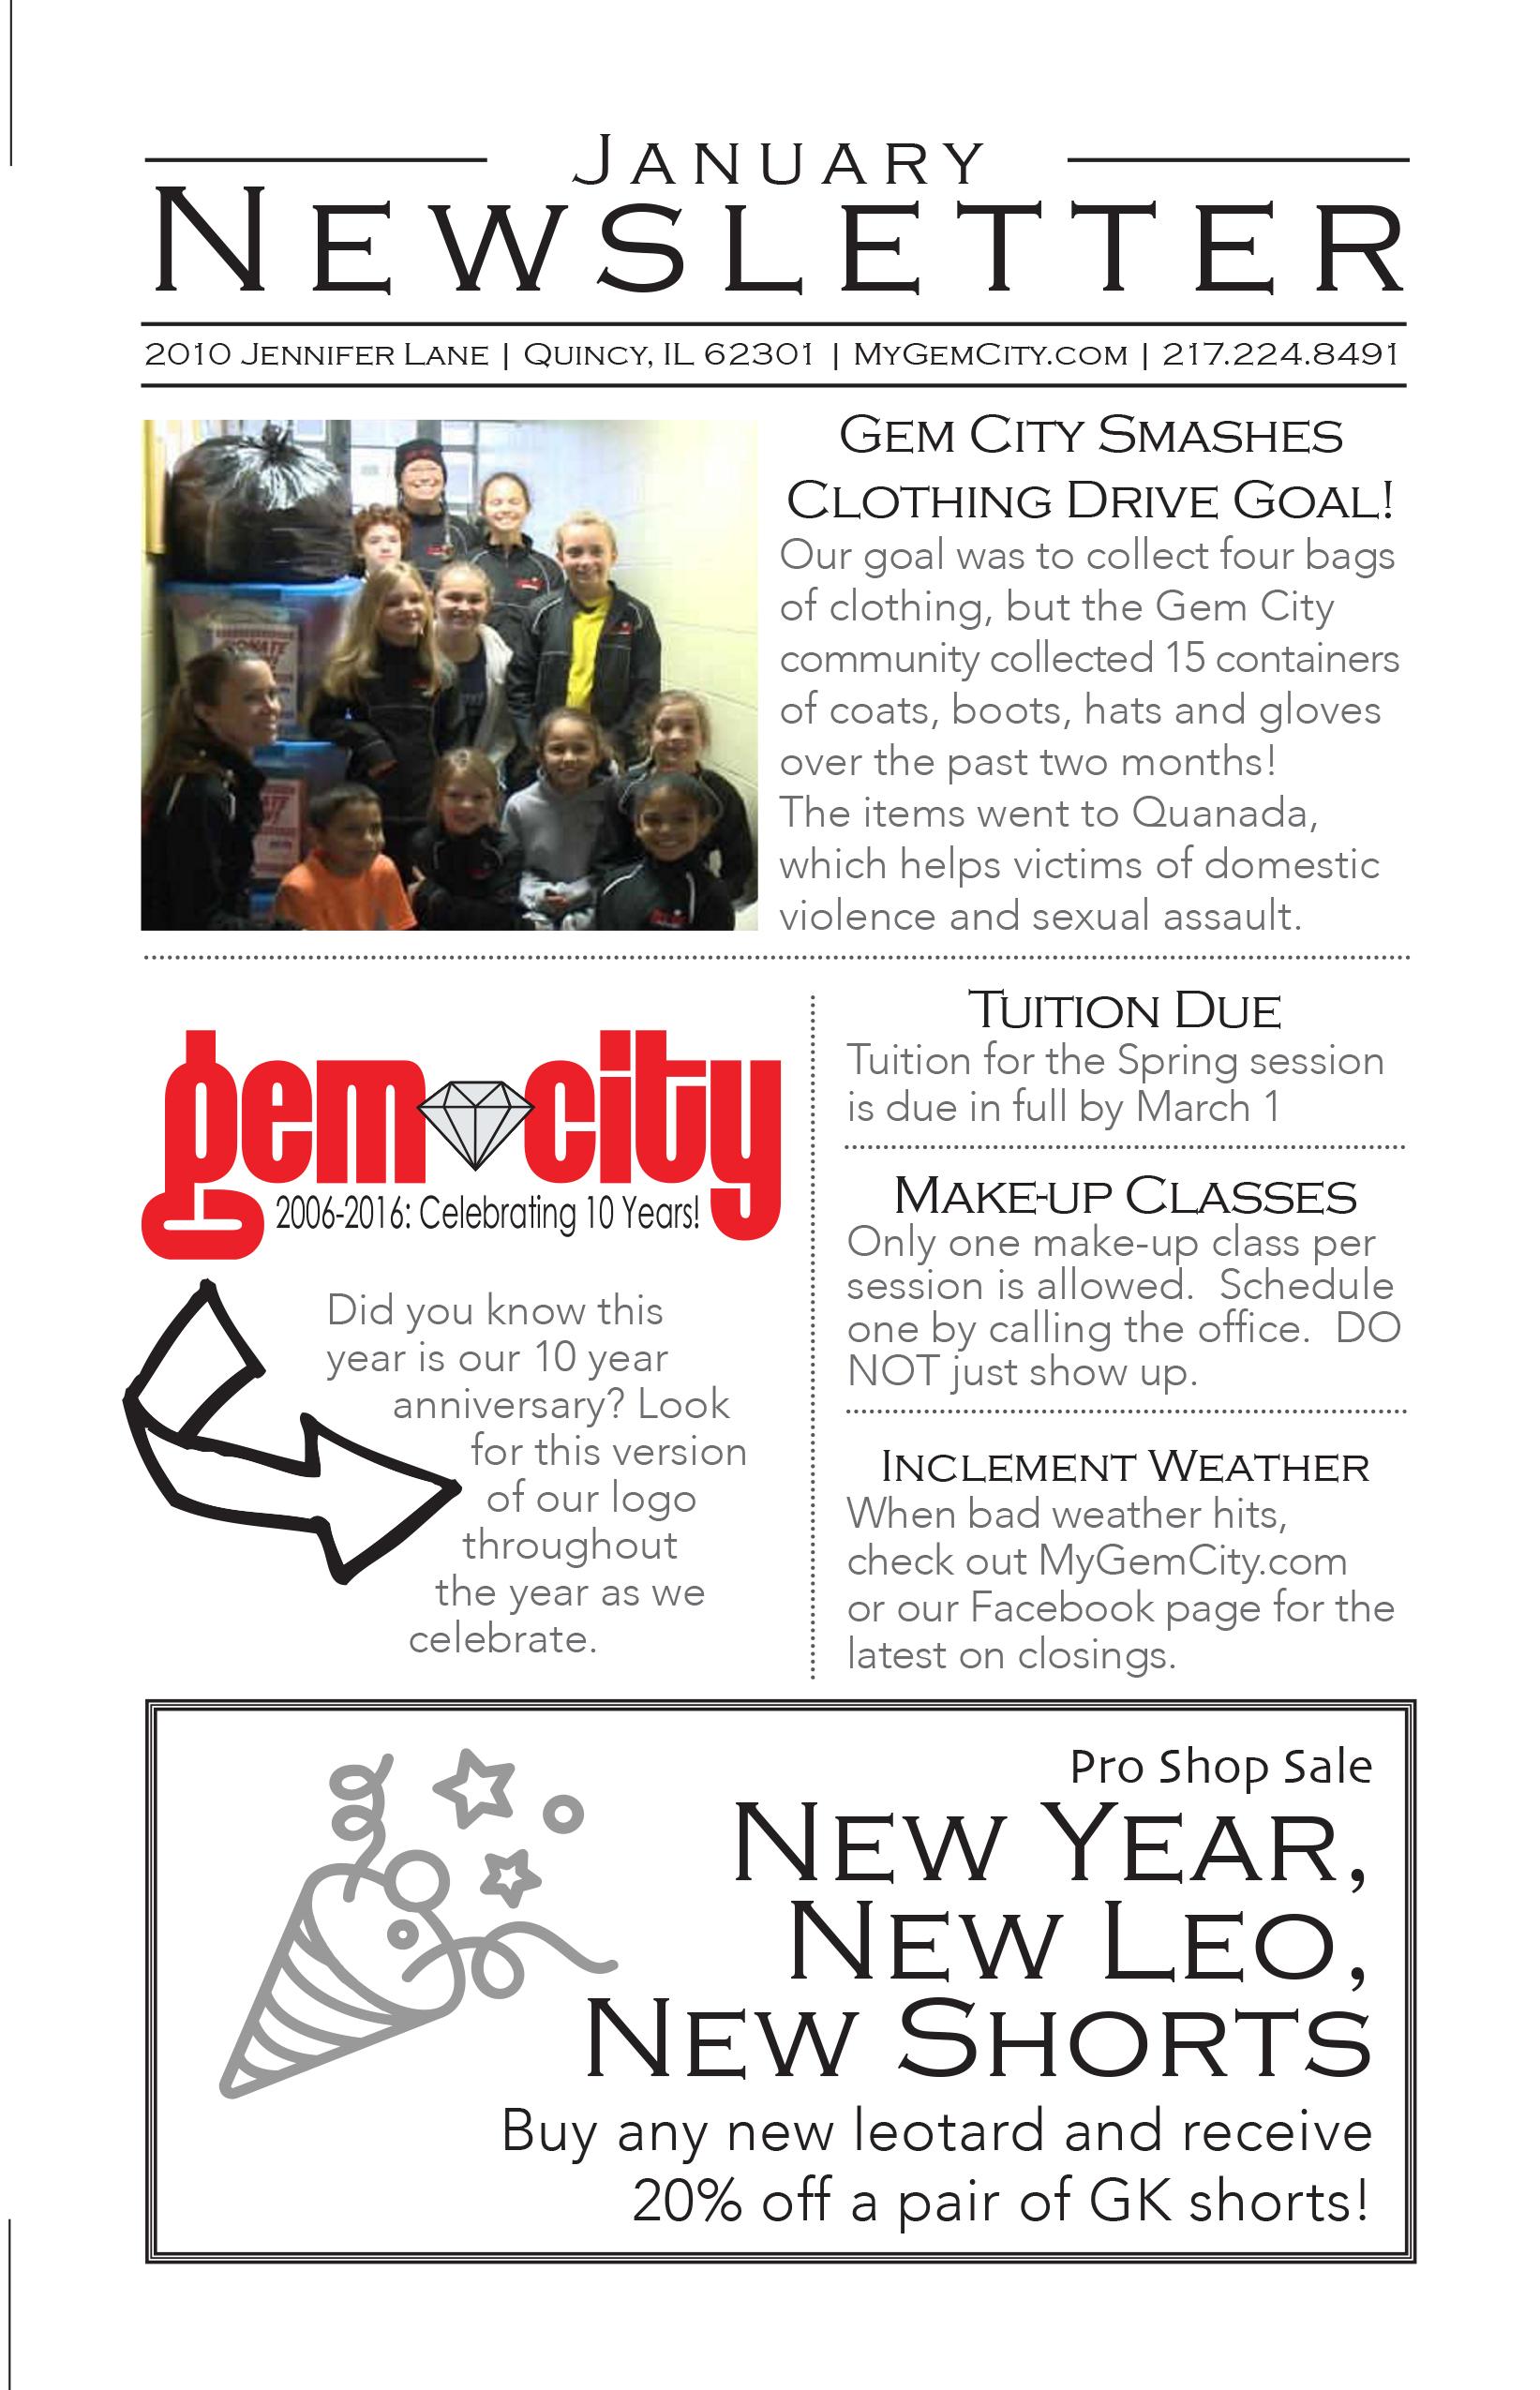 01-January-Newsletter.indd